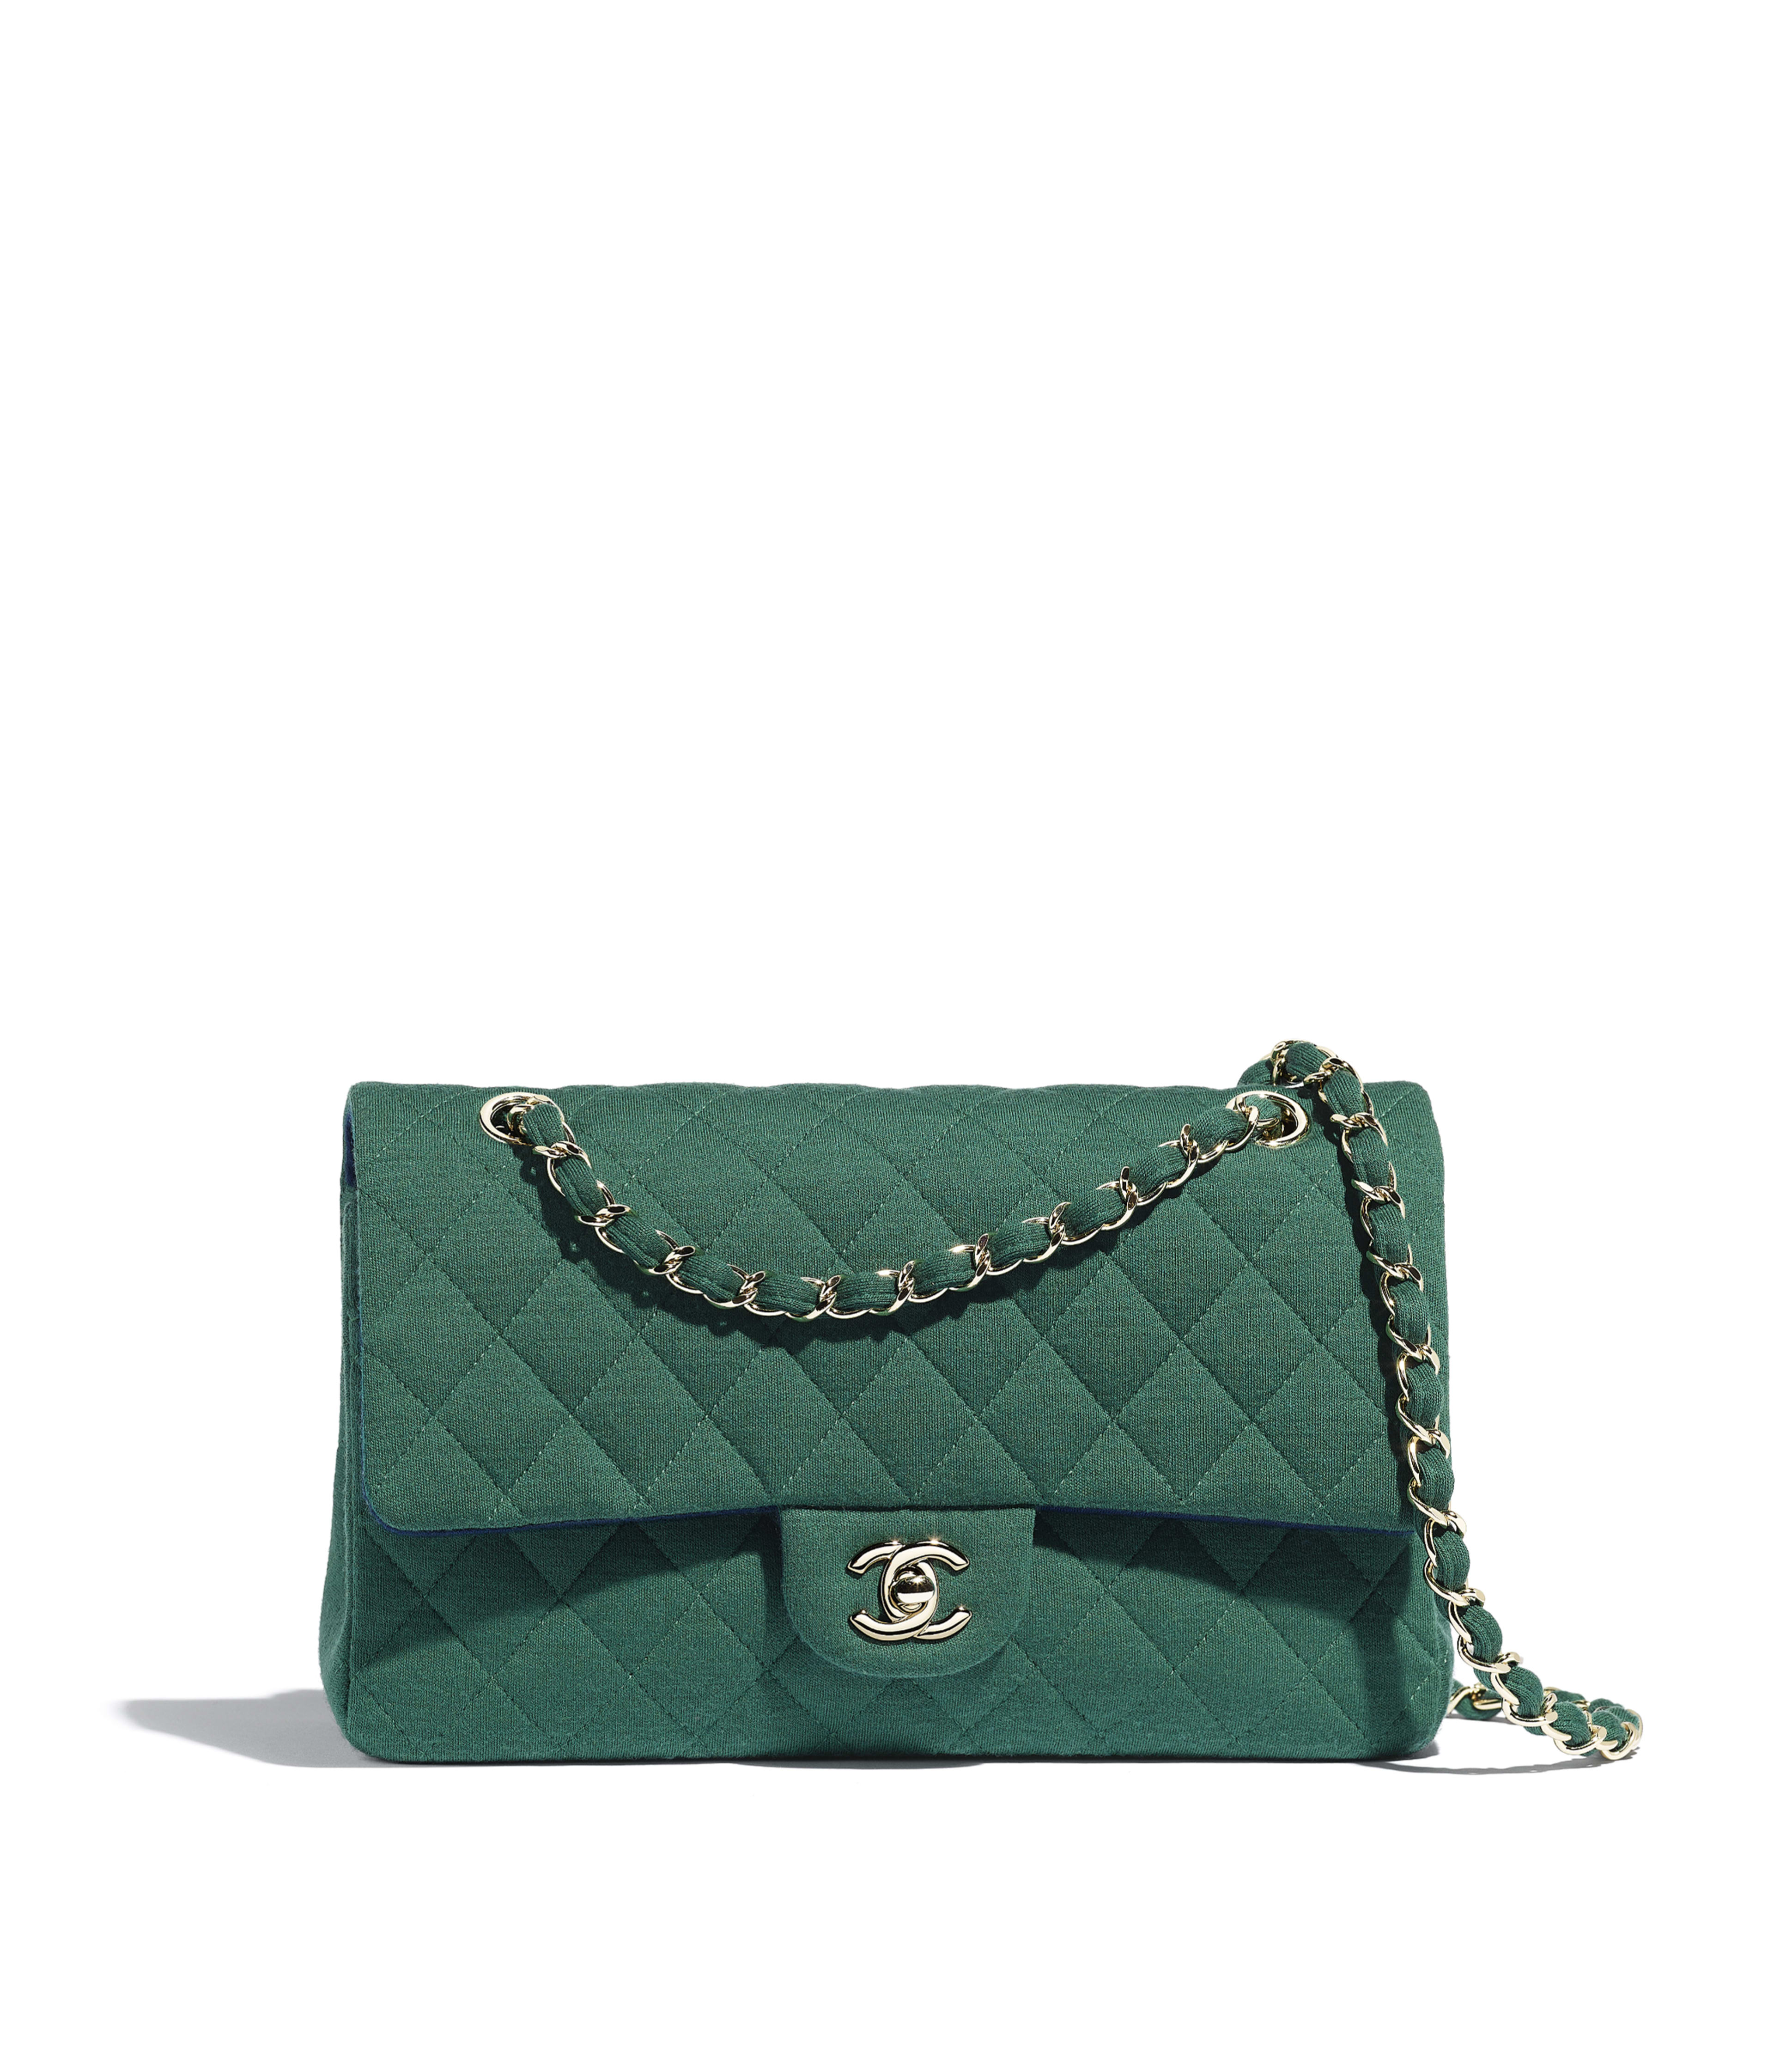 9e39a458 Classic - Handbags | CHANEL